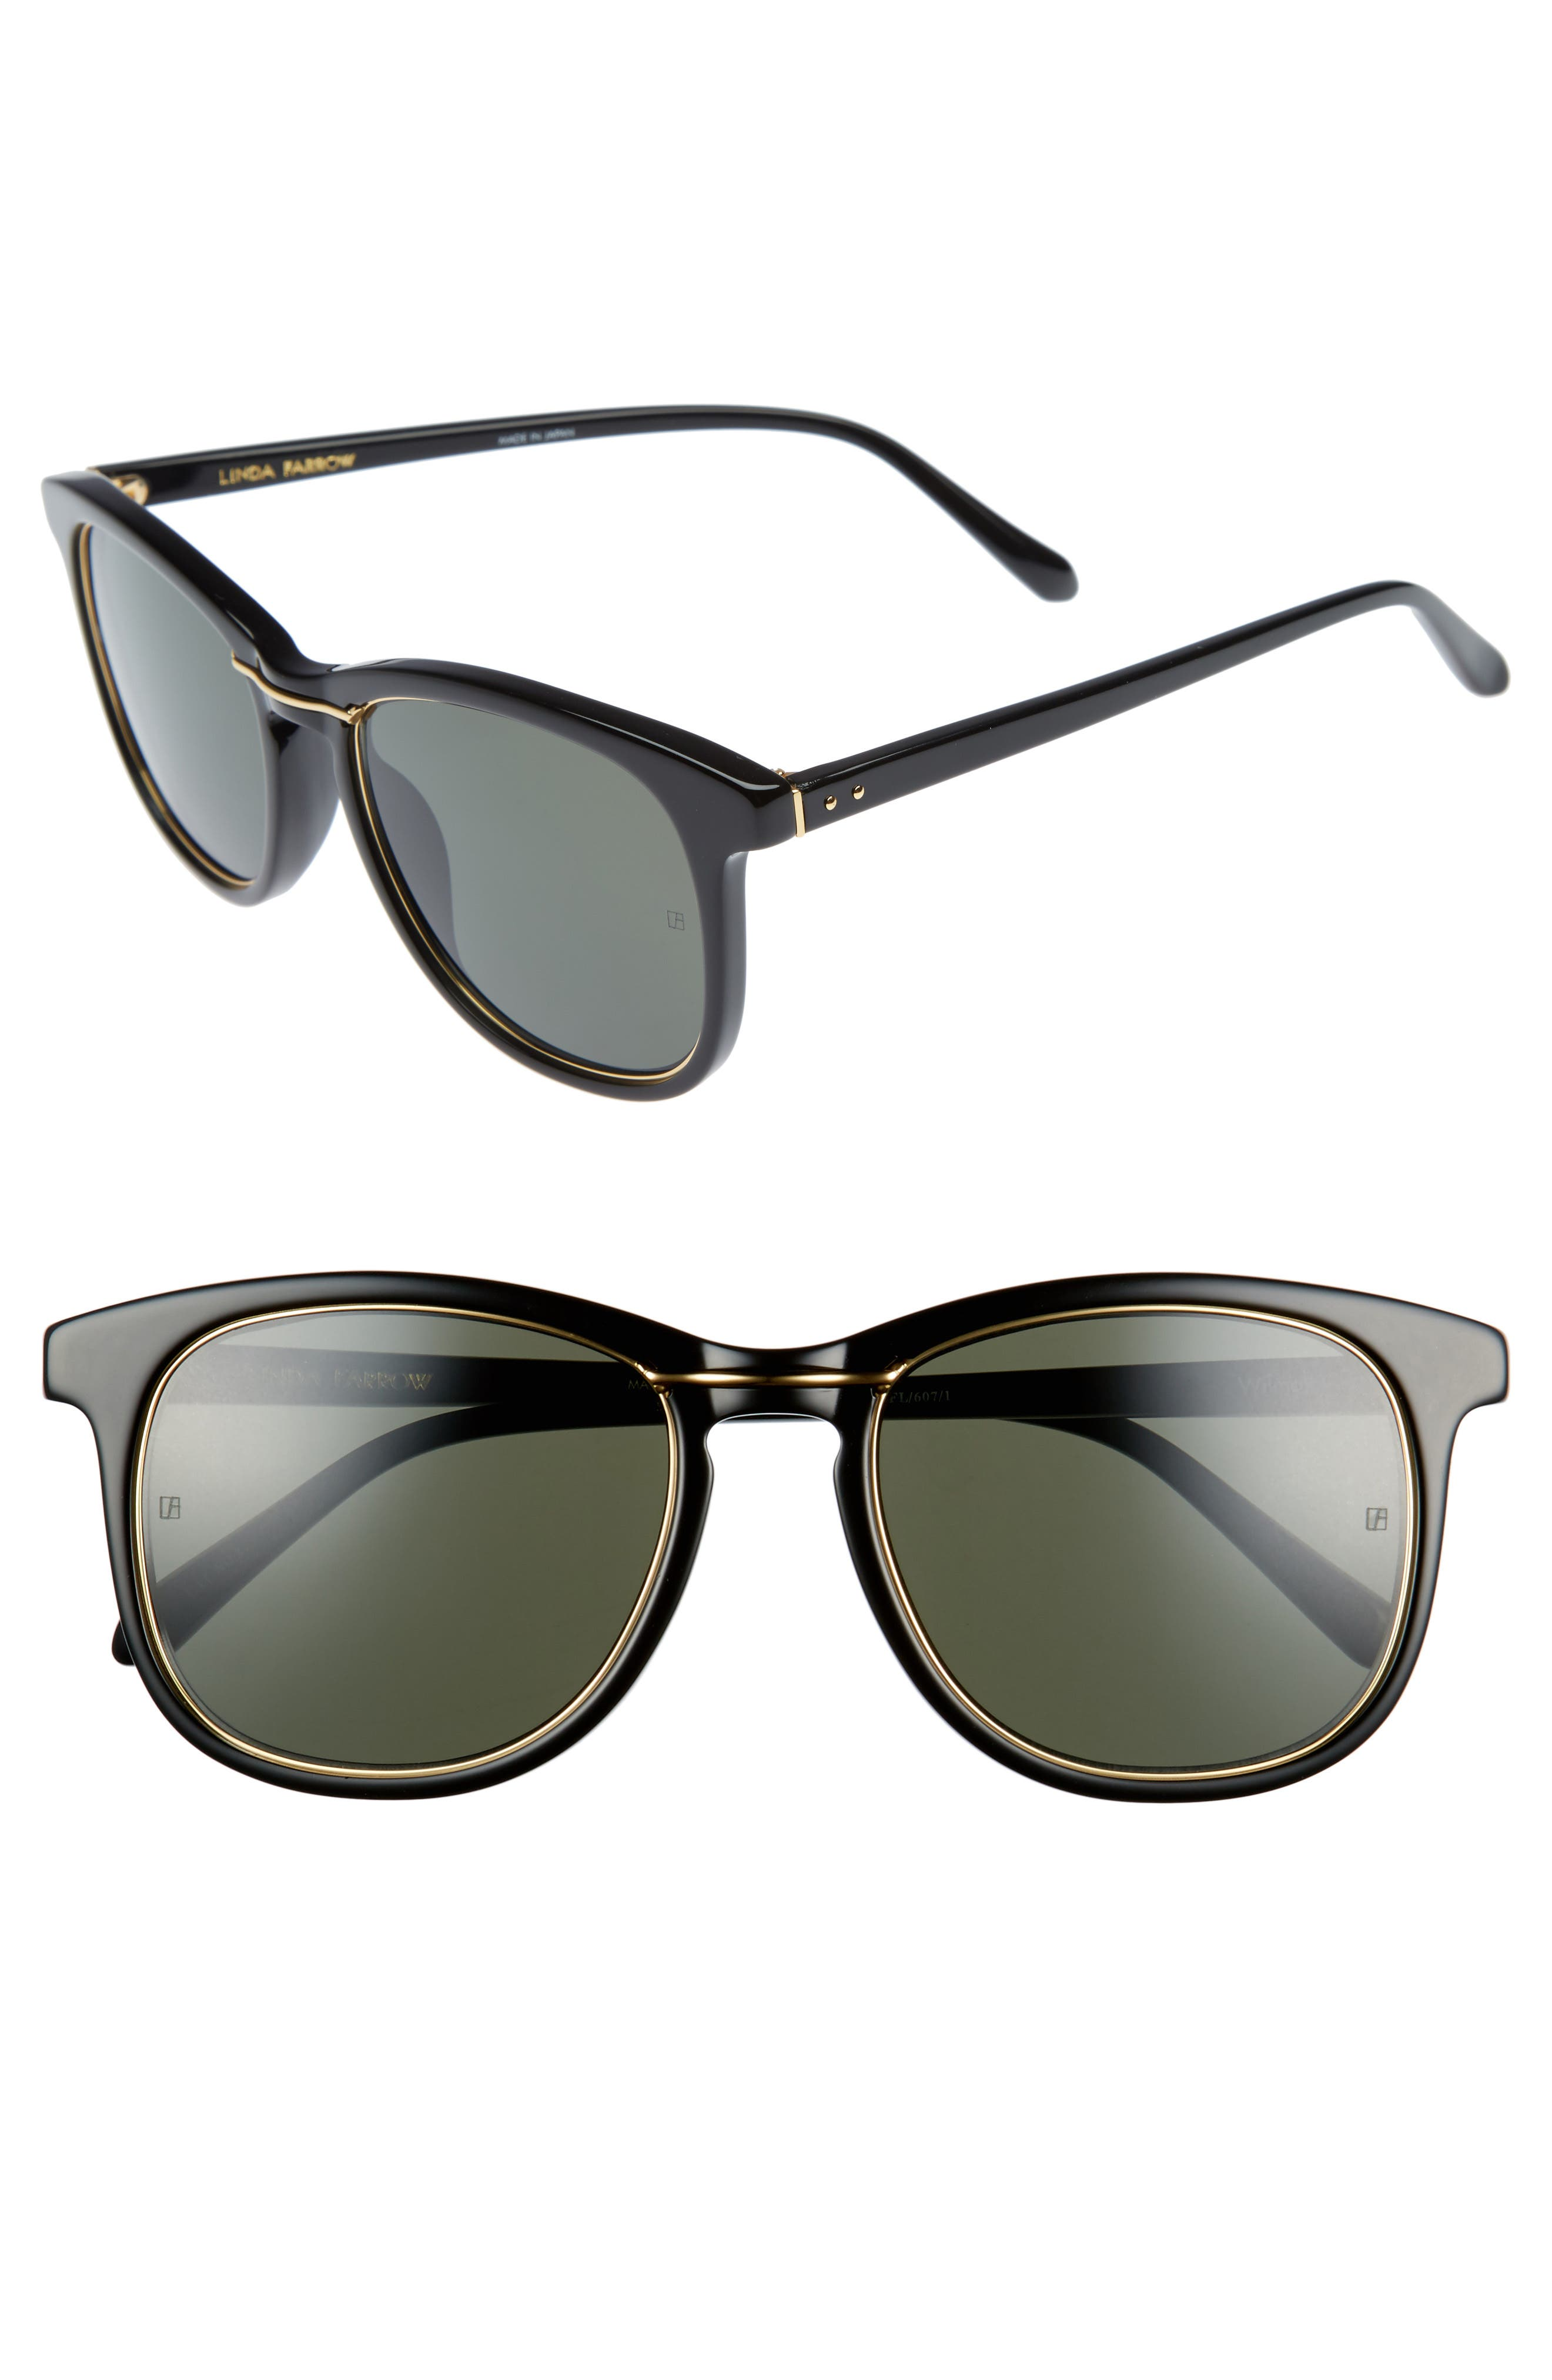 53mm Sunglasses,                             Main thumbnail 1, color,                             Wilmott Black/ Yellow Gold